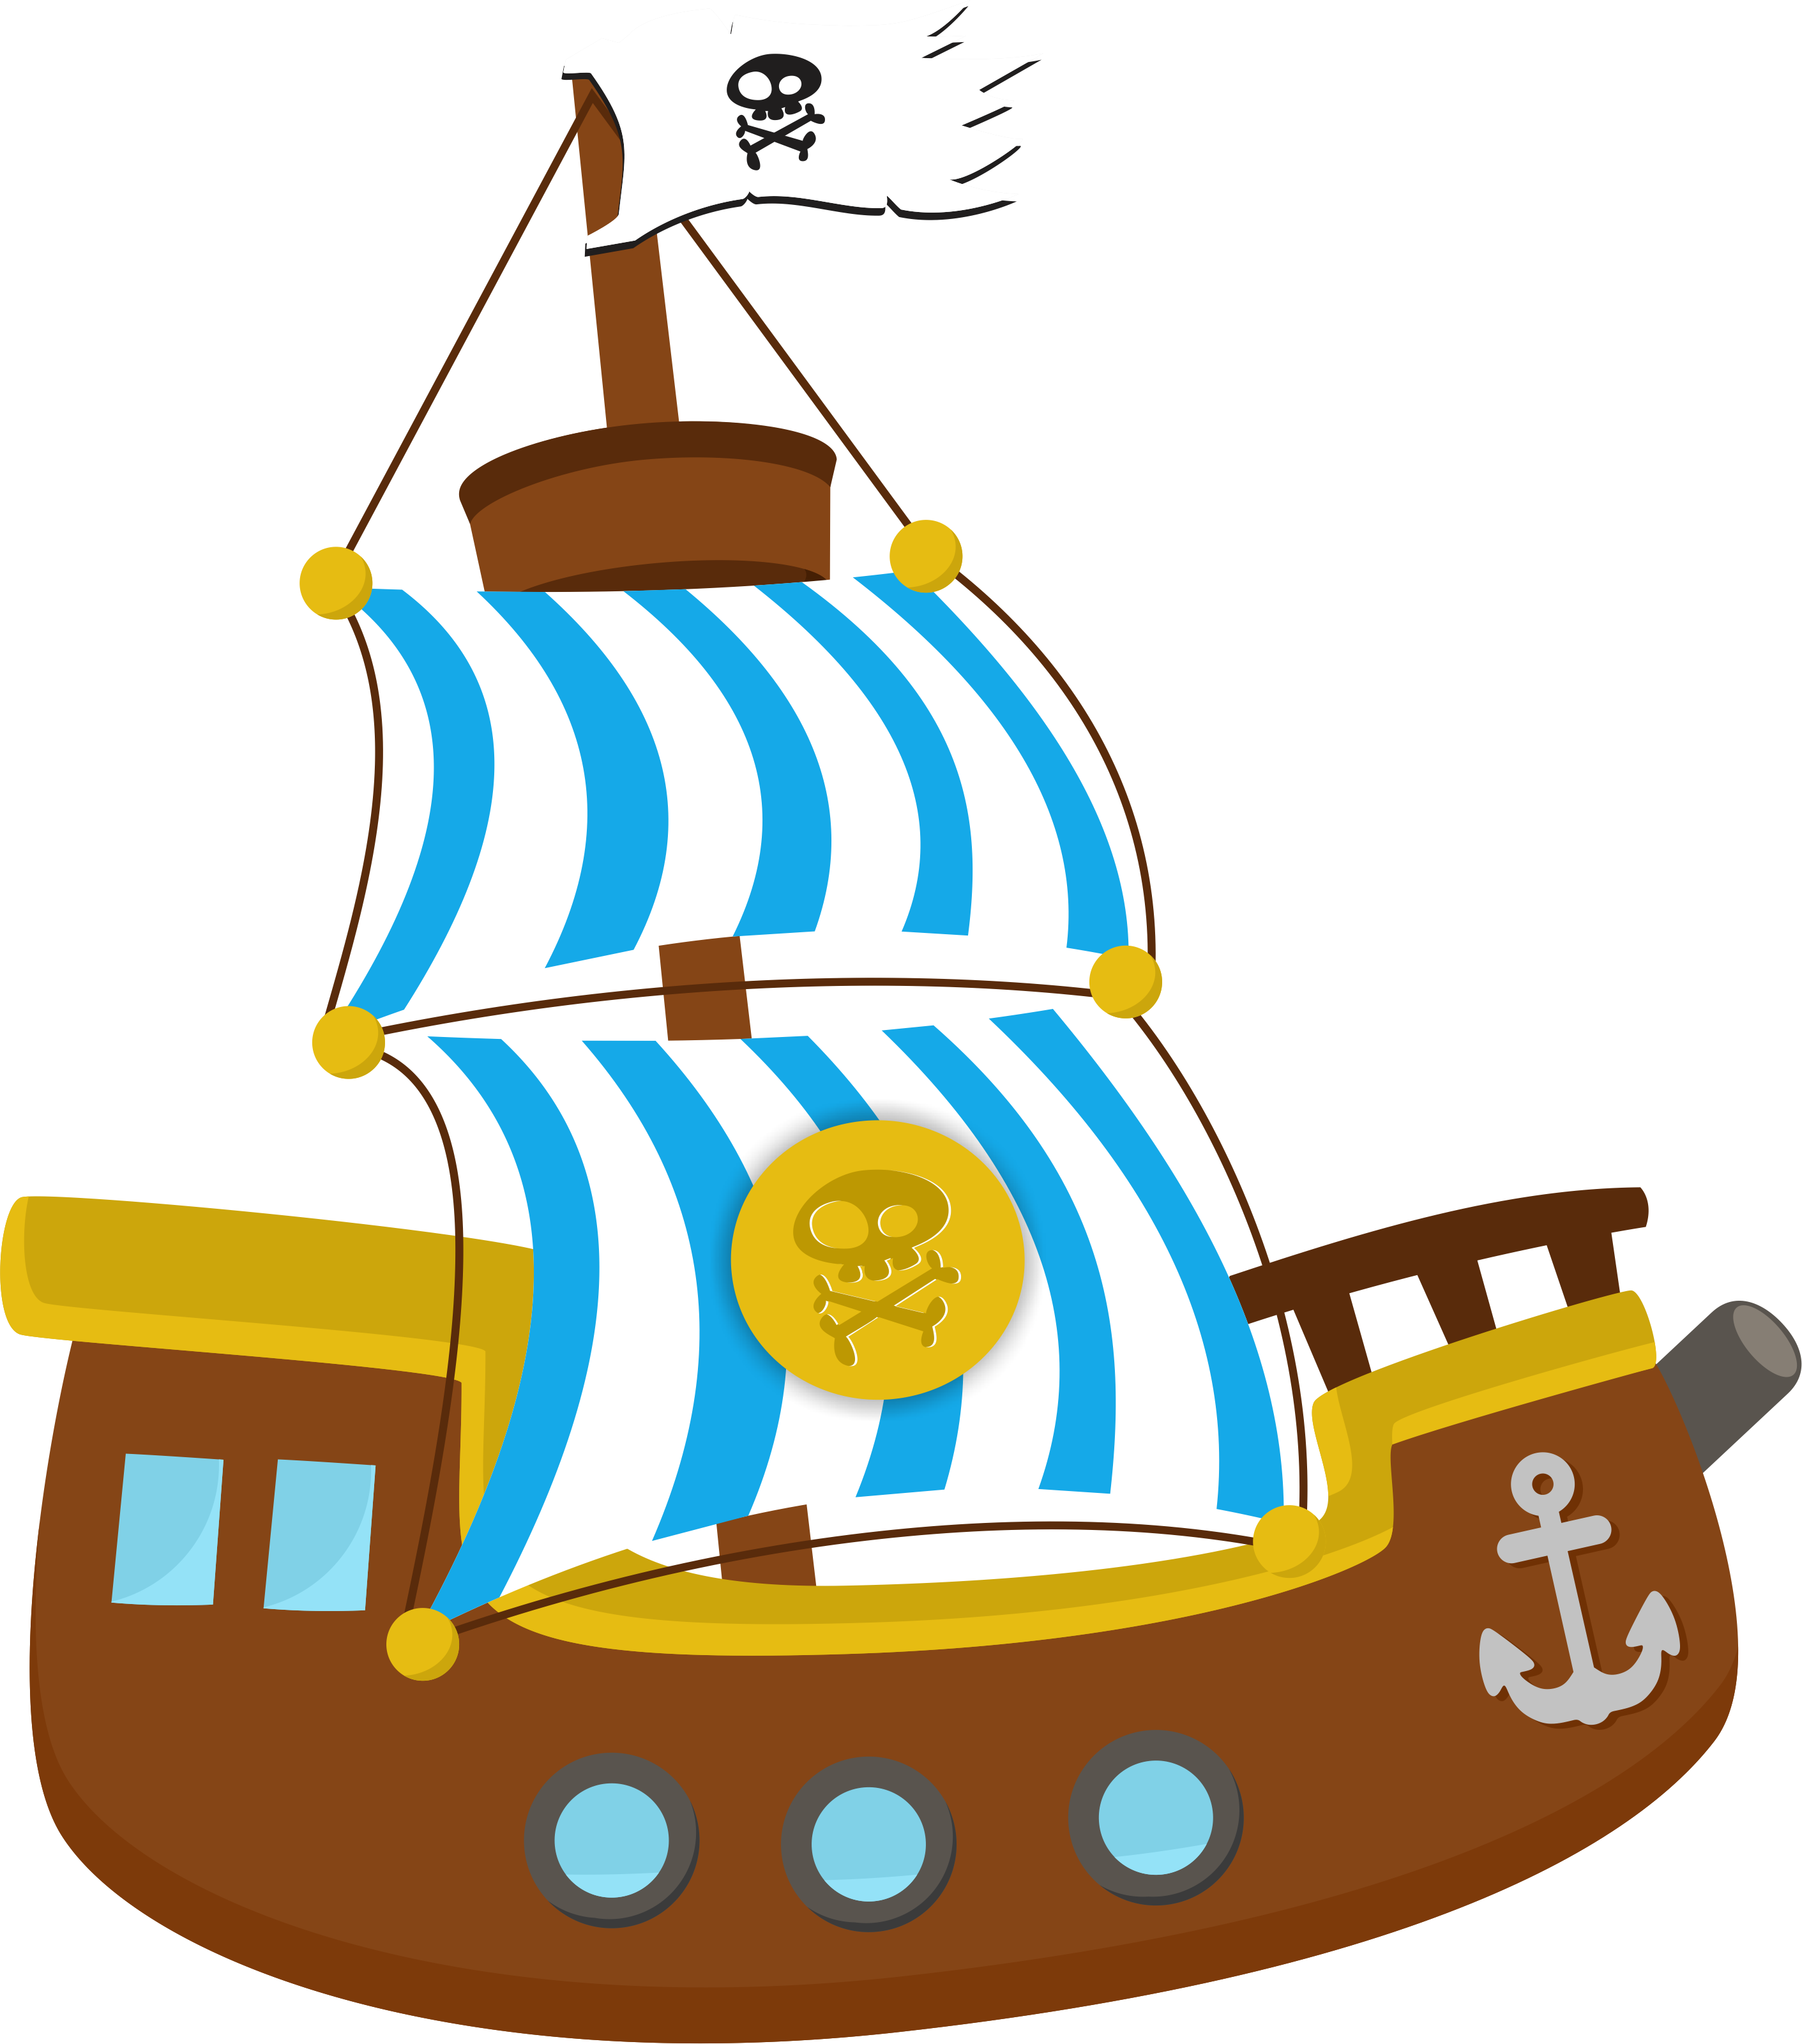 minus selma de avila bueno cumplea os jake pirata pinterest rh pinterest com au ship clipart black and white ship clipart